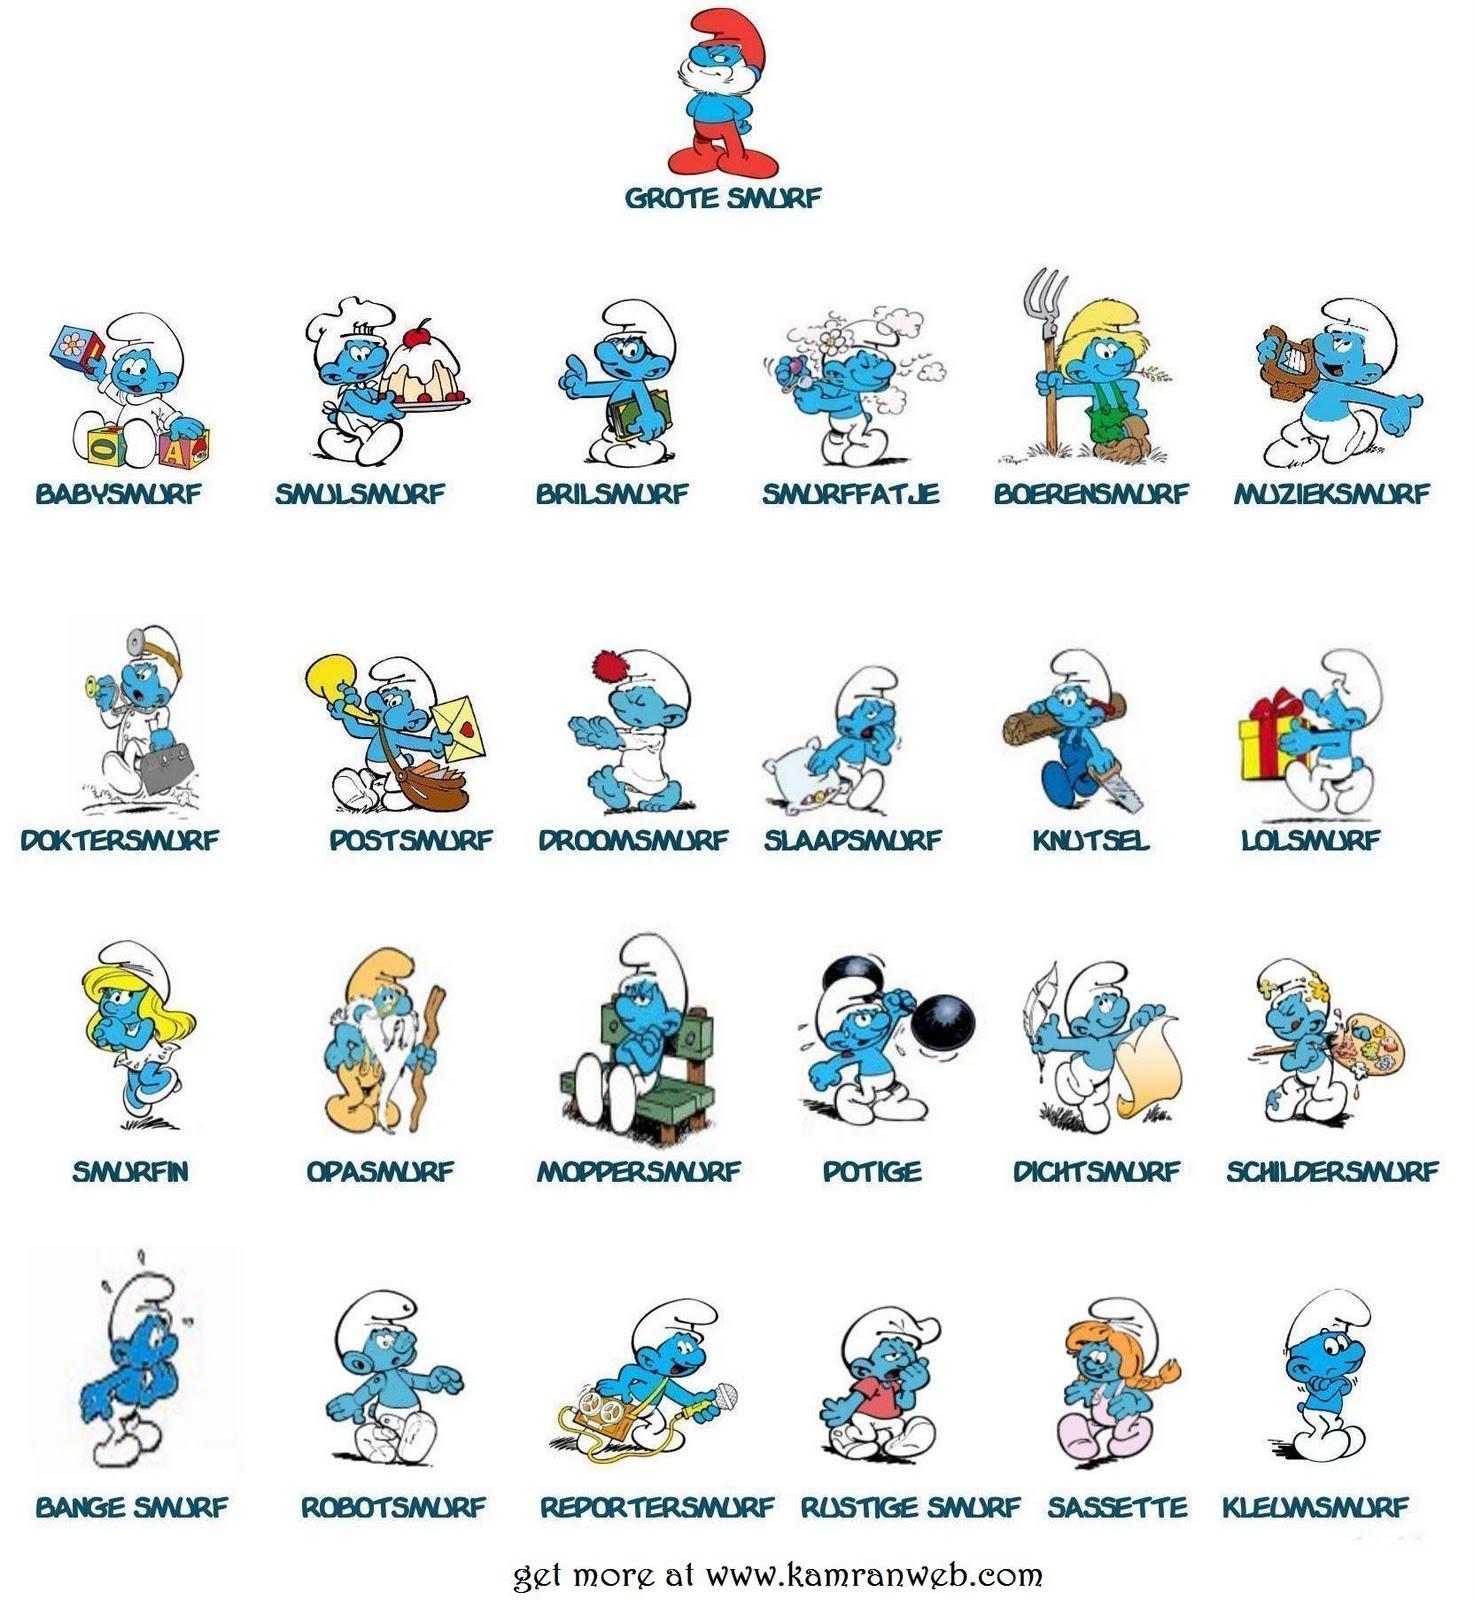 The Smurfs - UtaraSelatan